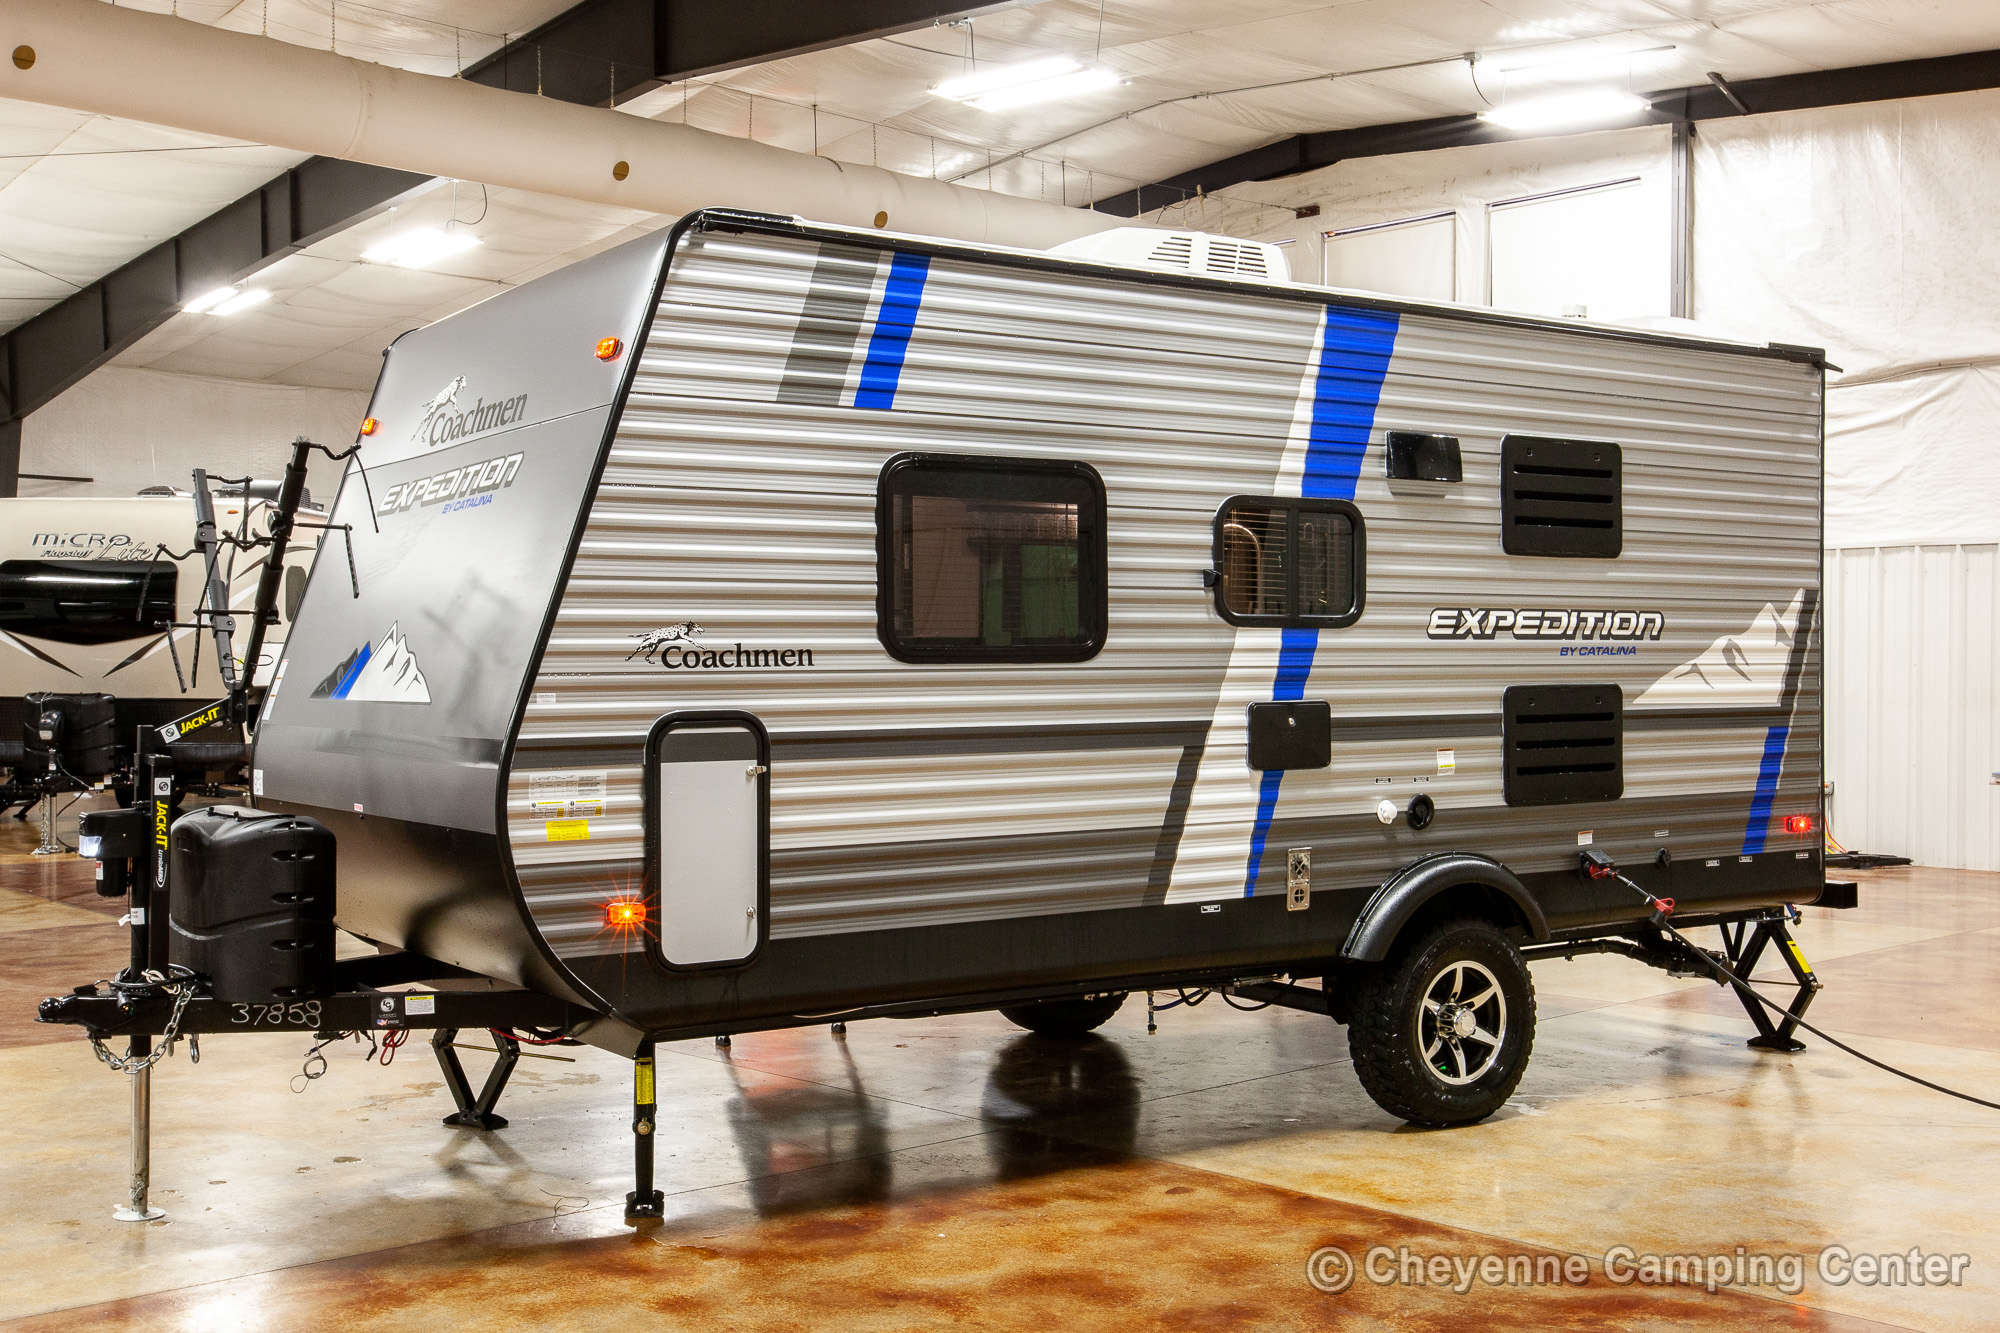 2021 Coachmen  Catalina Expedition 192RB Travel Trailer Exterior Image